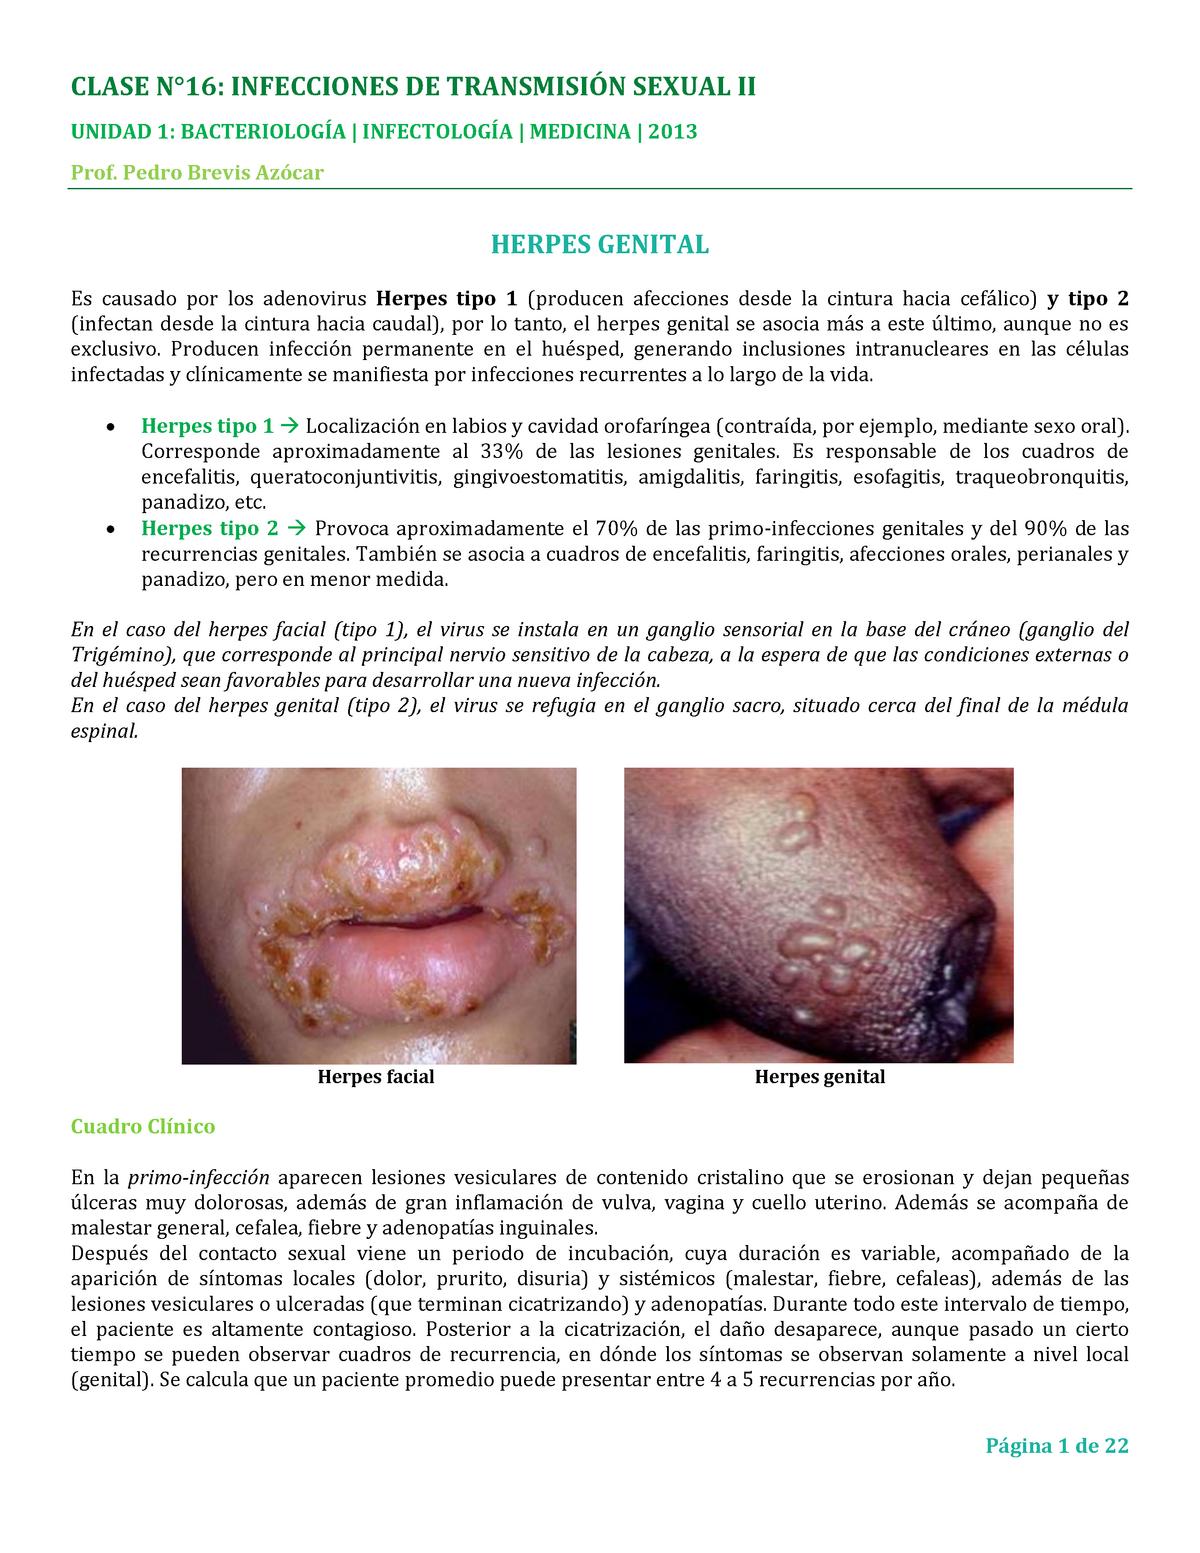 ureaplasma mycoplasma condilom